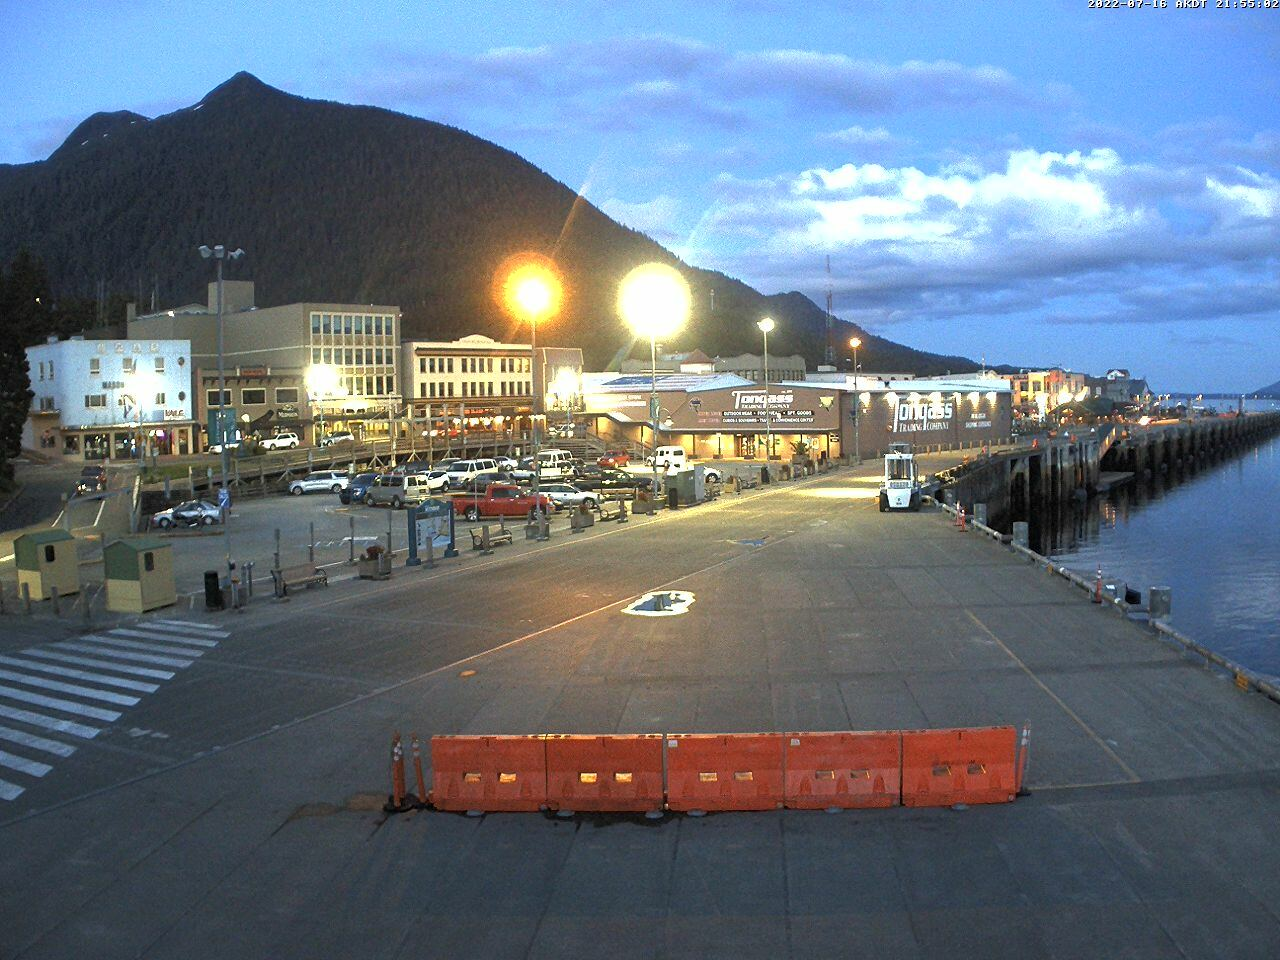 Current Ketchikan Webcam Alaska-sized Image